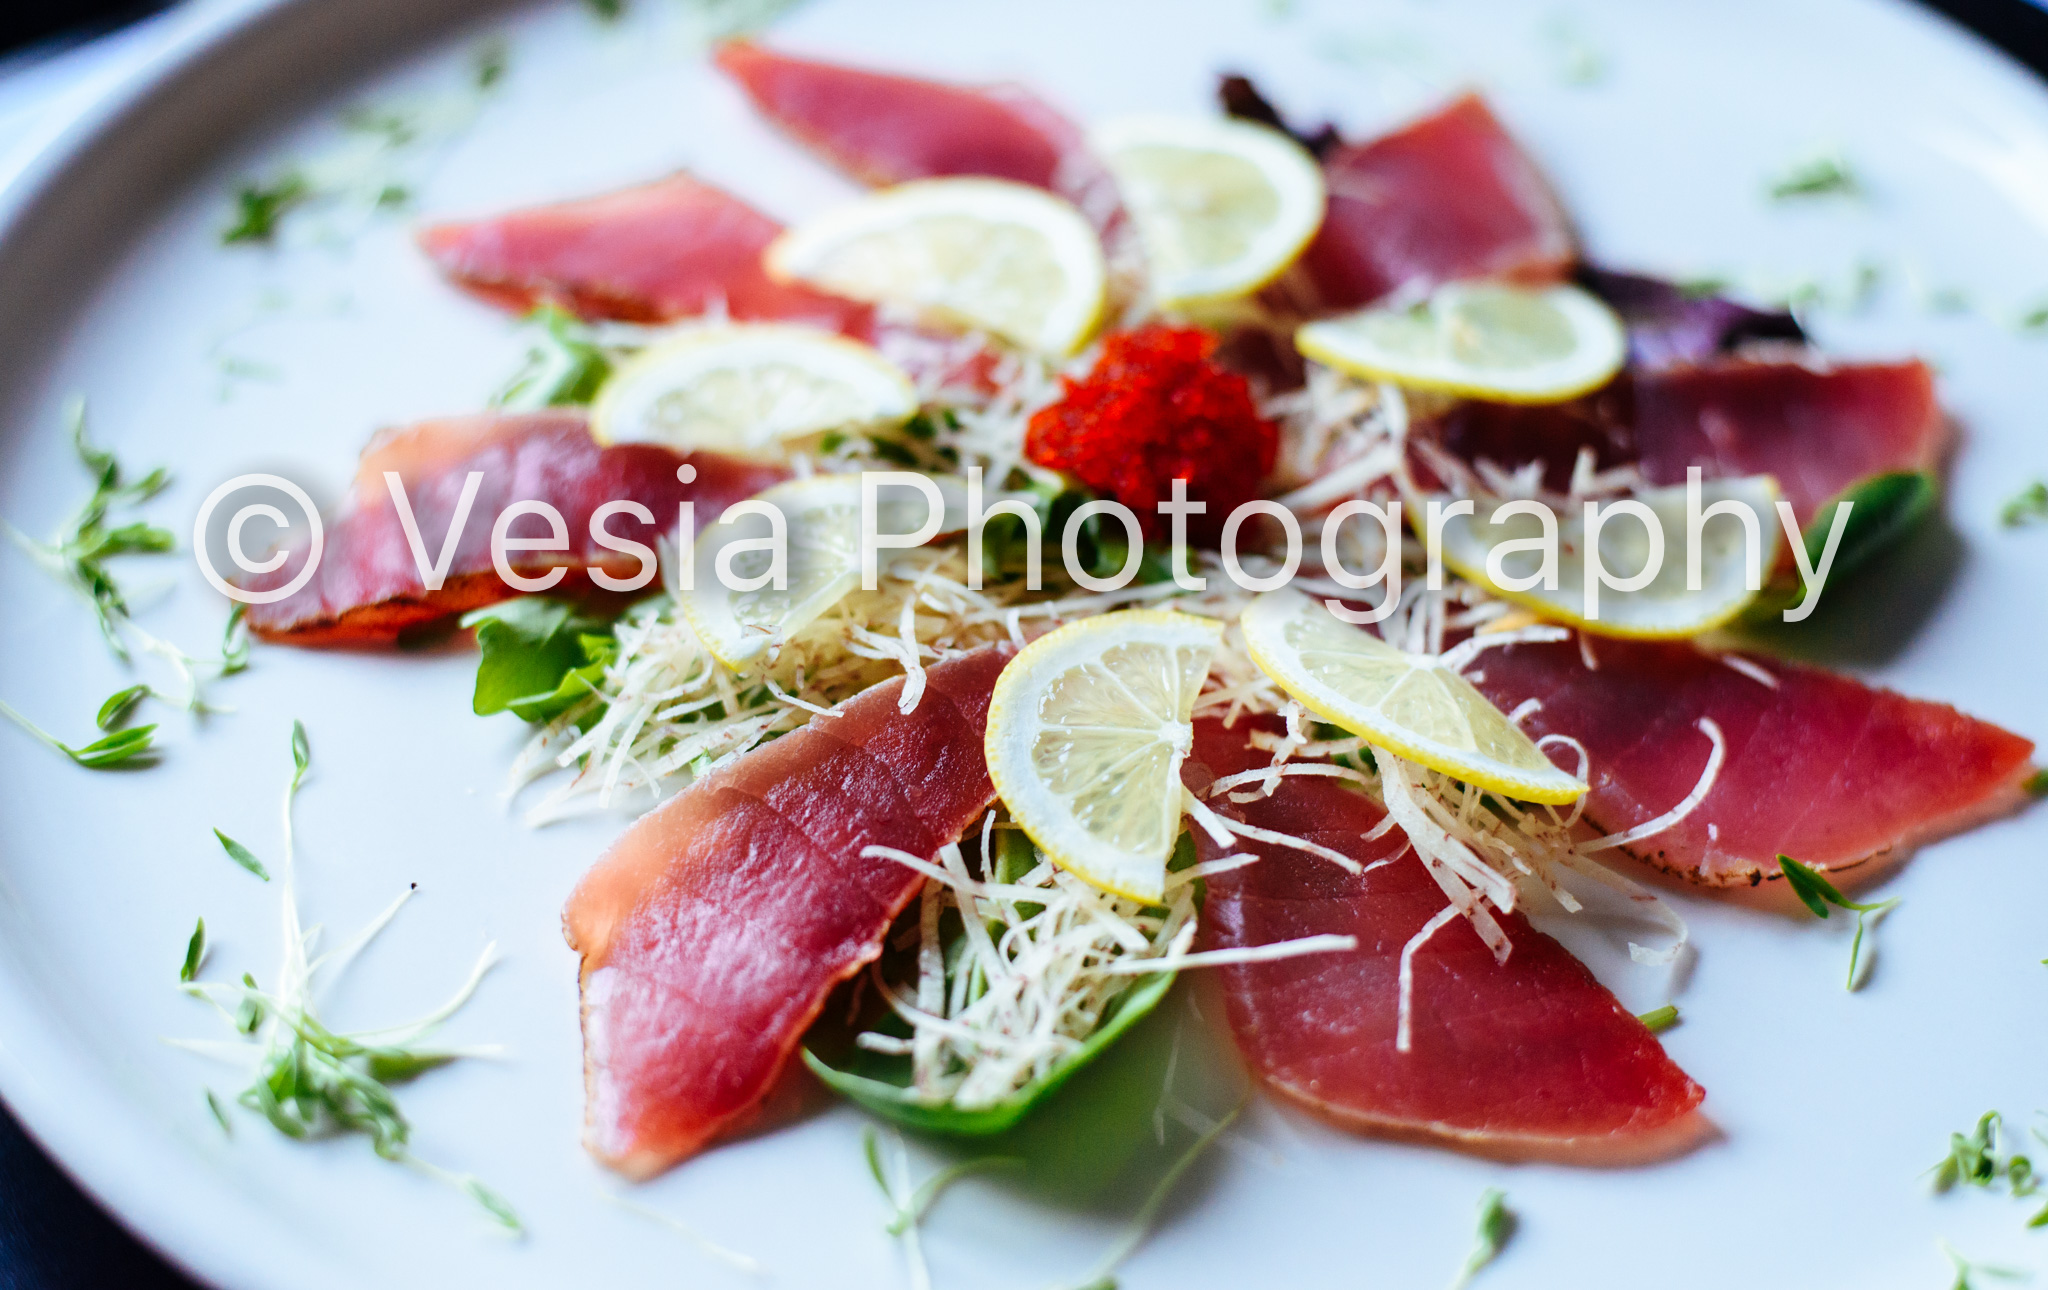 Caviar_Sushi_Proofs-2.jpg